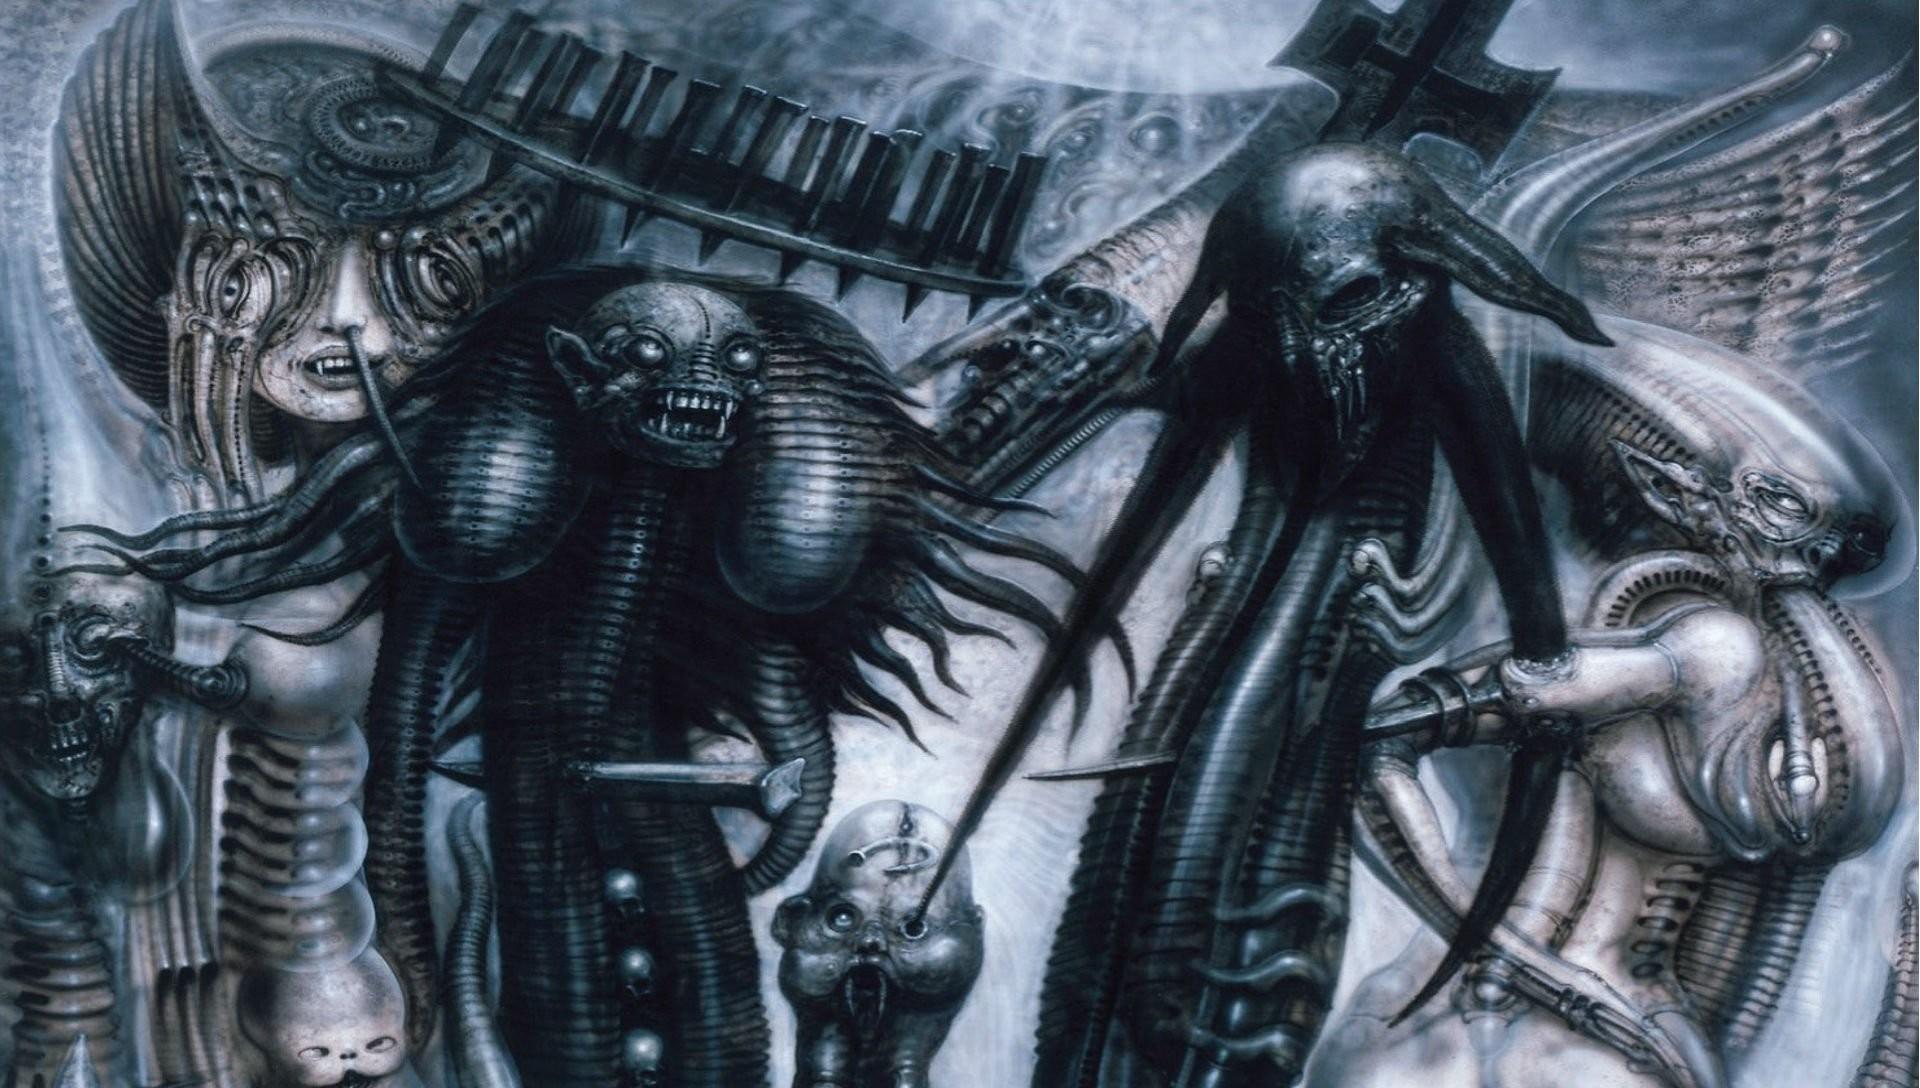 1920x1088, H R Giger Art Artwork Dark Evil Artistic - Hr Giger Scariest Artwork - HD Wallpaper